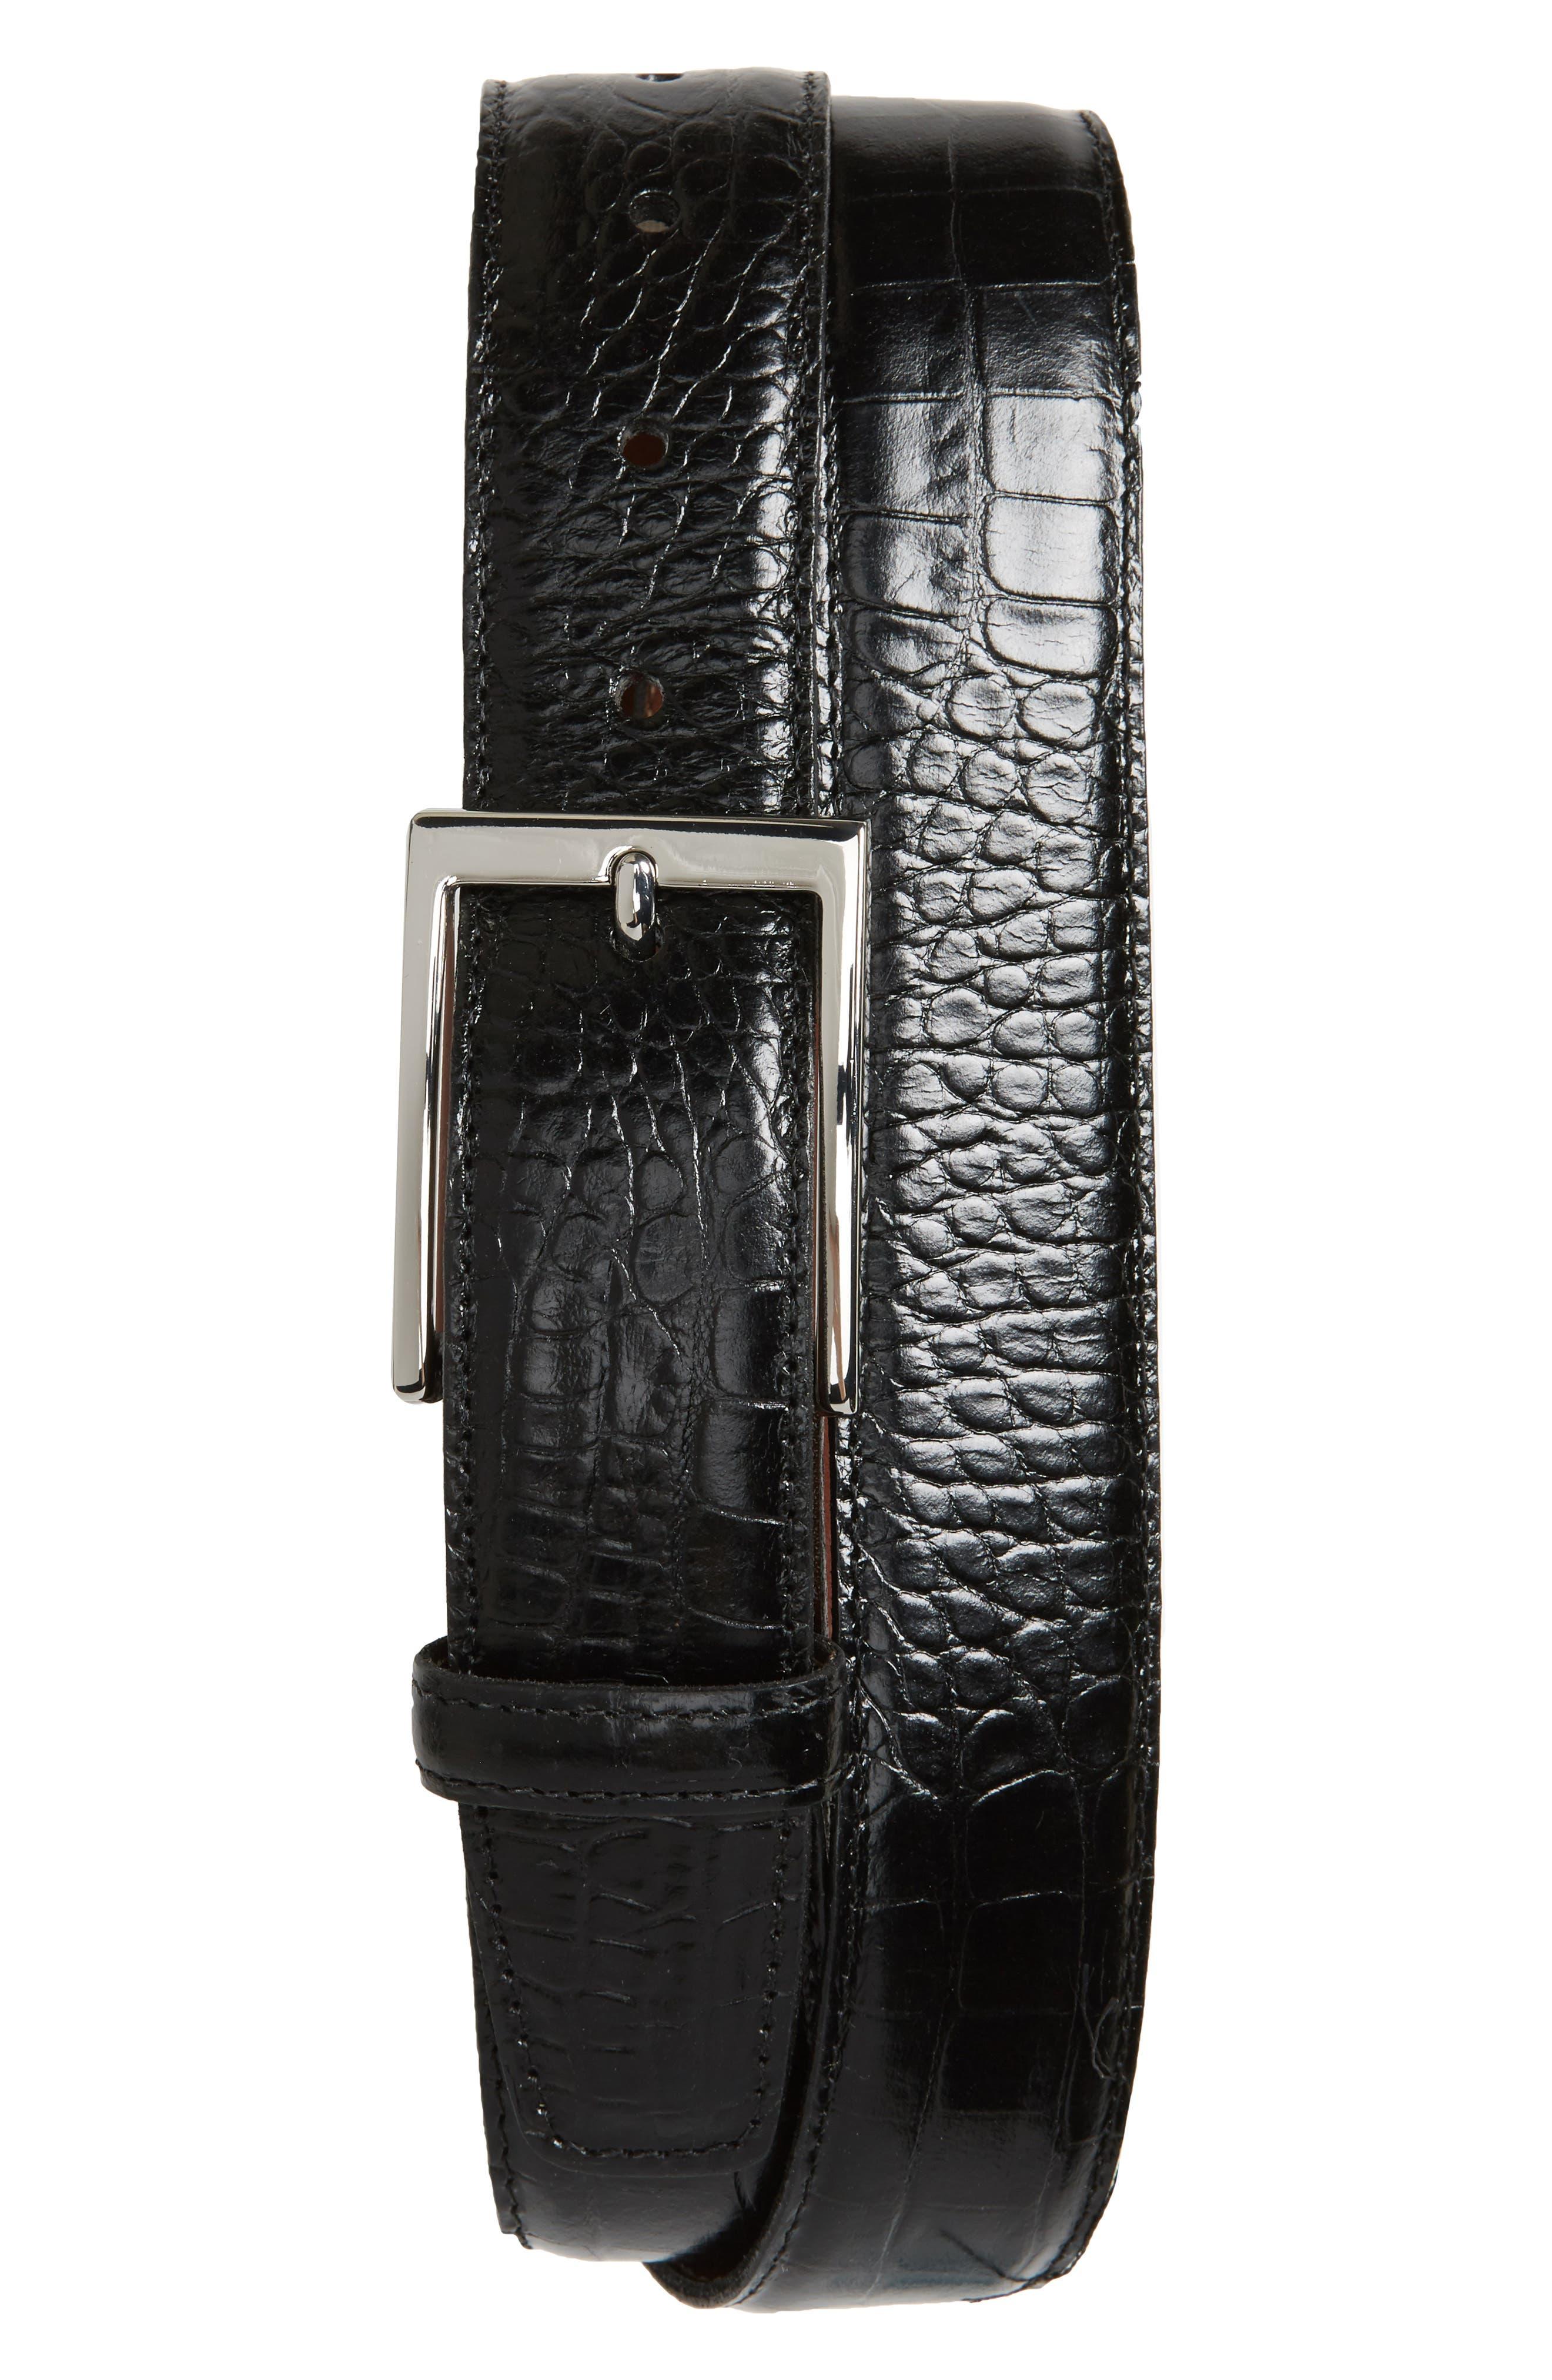 Gator Grain Embossed Leather Belt,                             Main thumbnail 1, color,                             Black